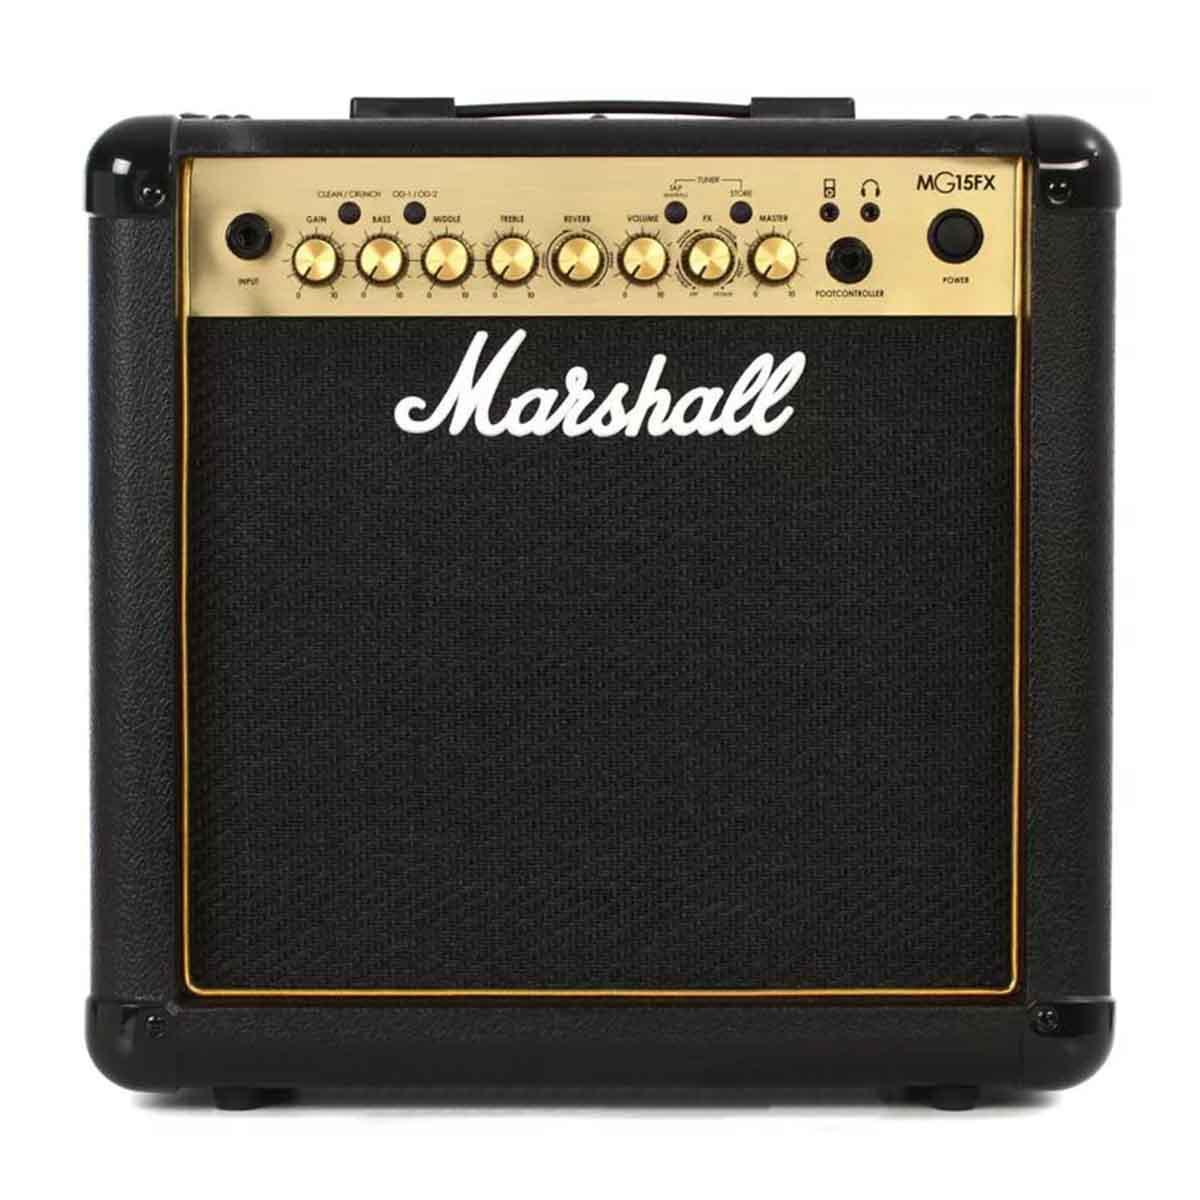 Amplificador de Guitarra Marshall MG15FX Carbon Fiber Gold 15 Watts RMS